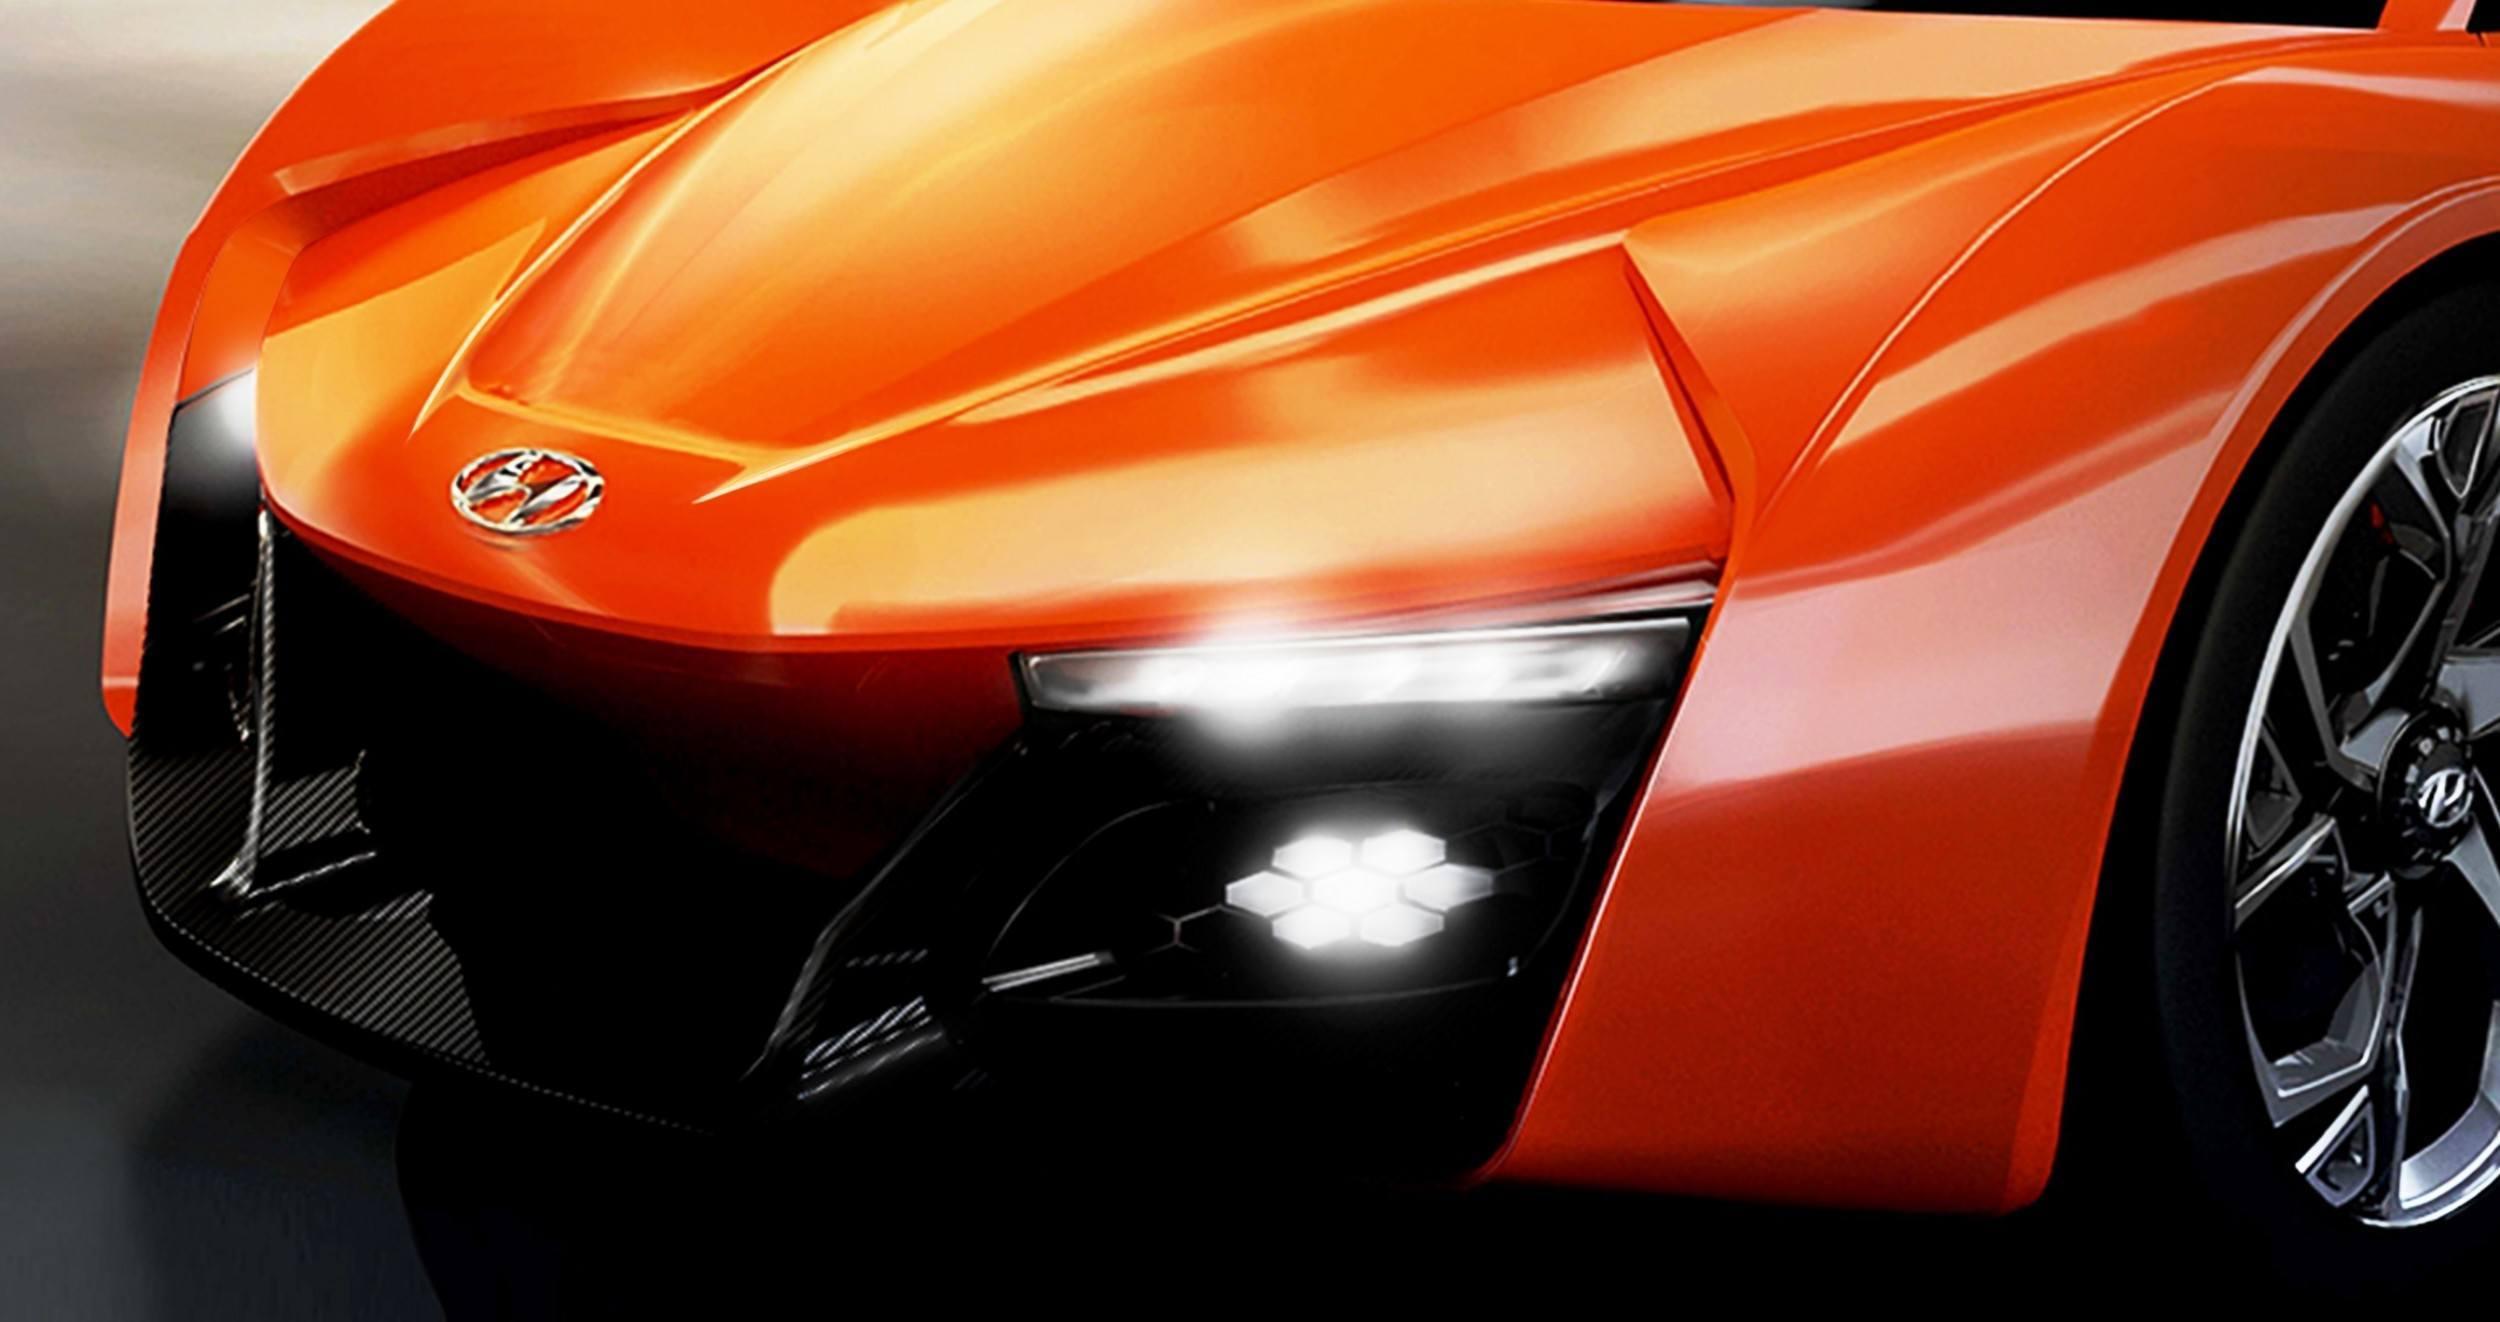 Hyundai Passocorto Sports Car Is Torino Design Vision Come To Life Innovative Folded Surfacing Hidden Cameras Replace Rear Glass 4